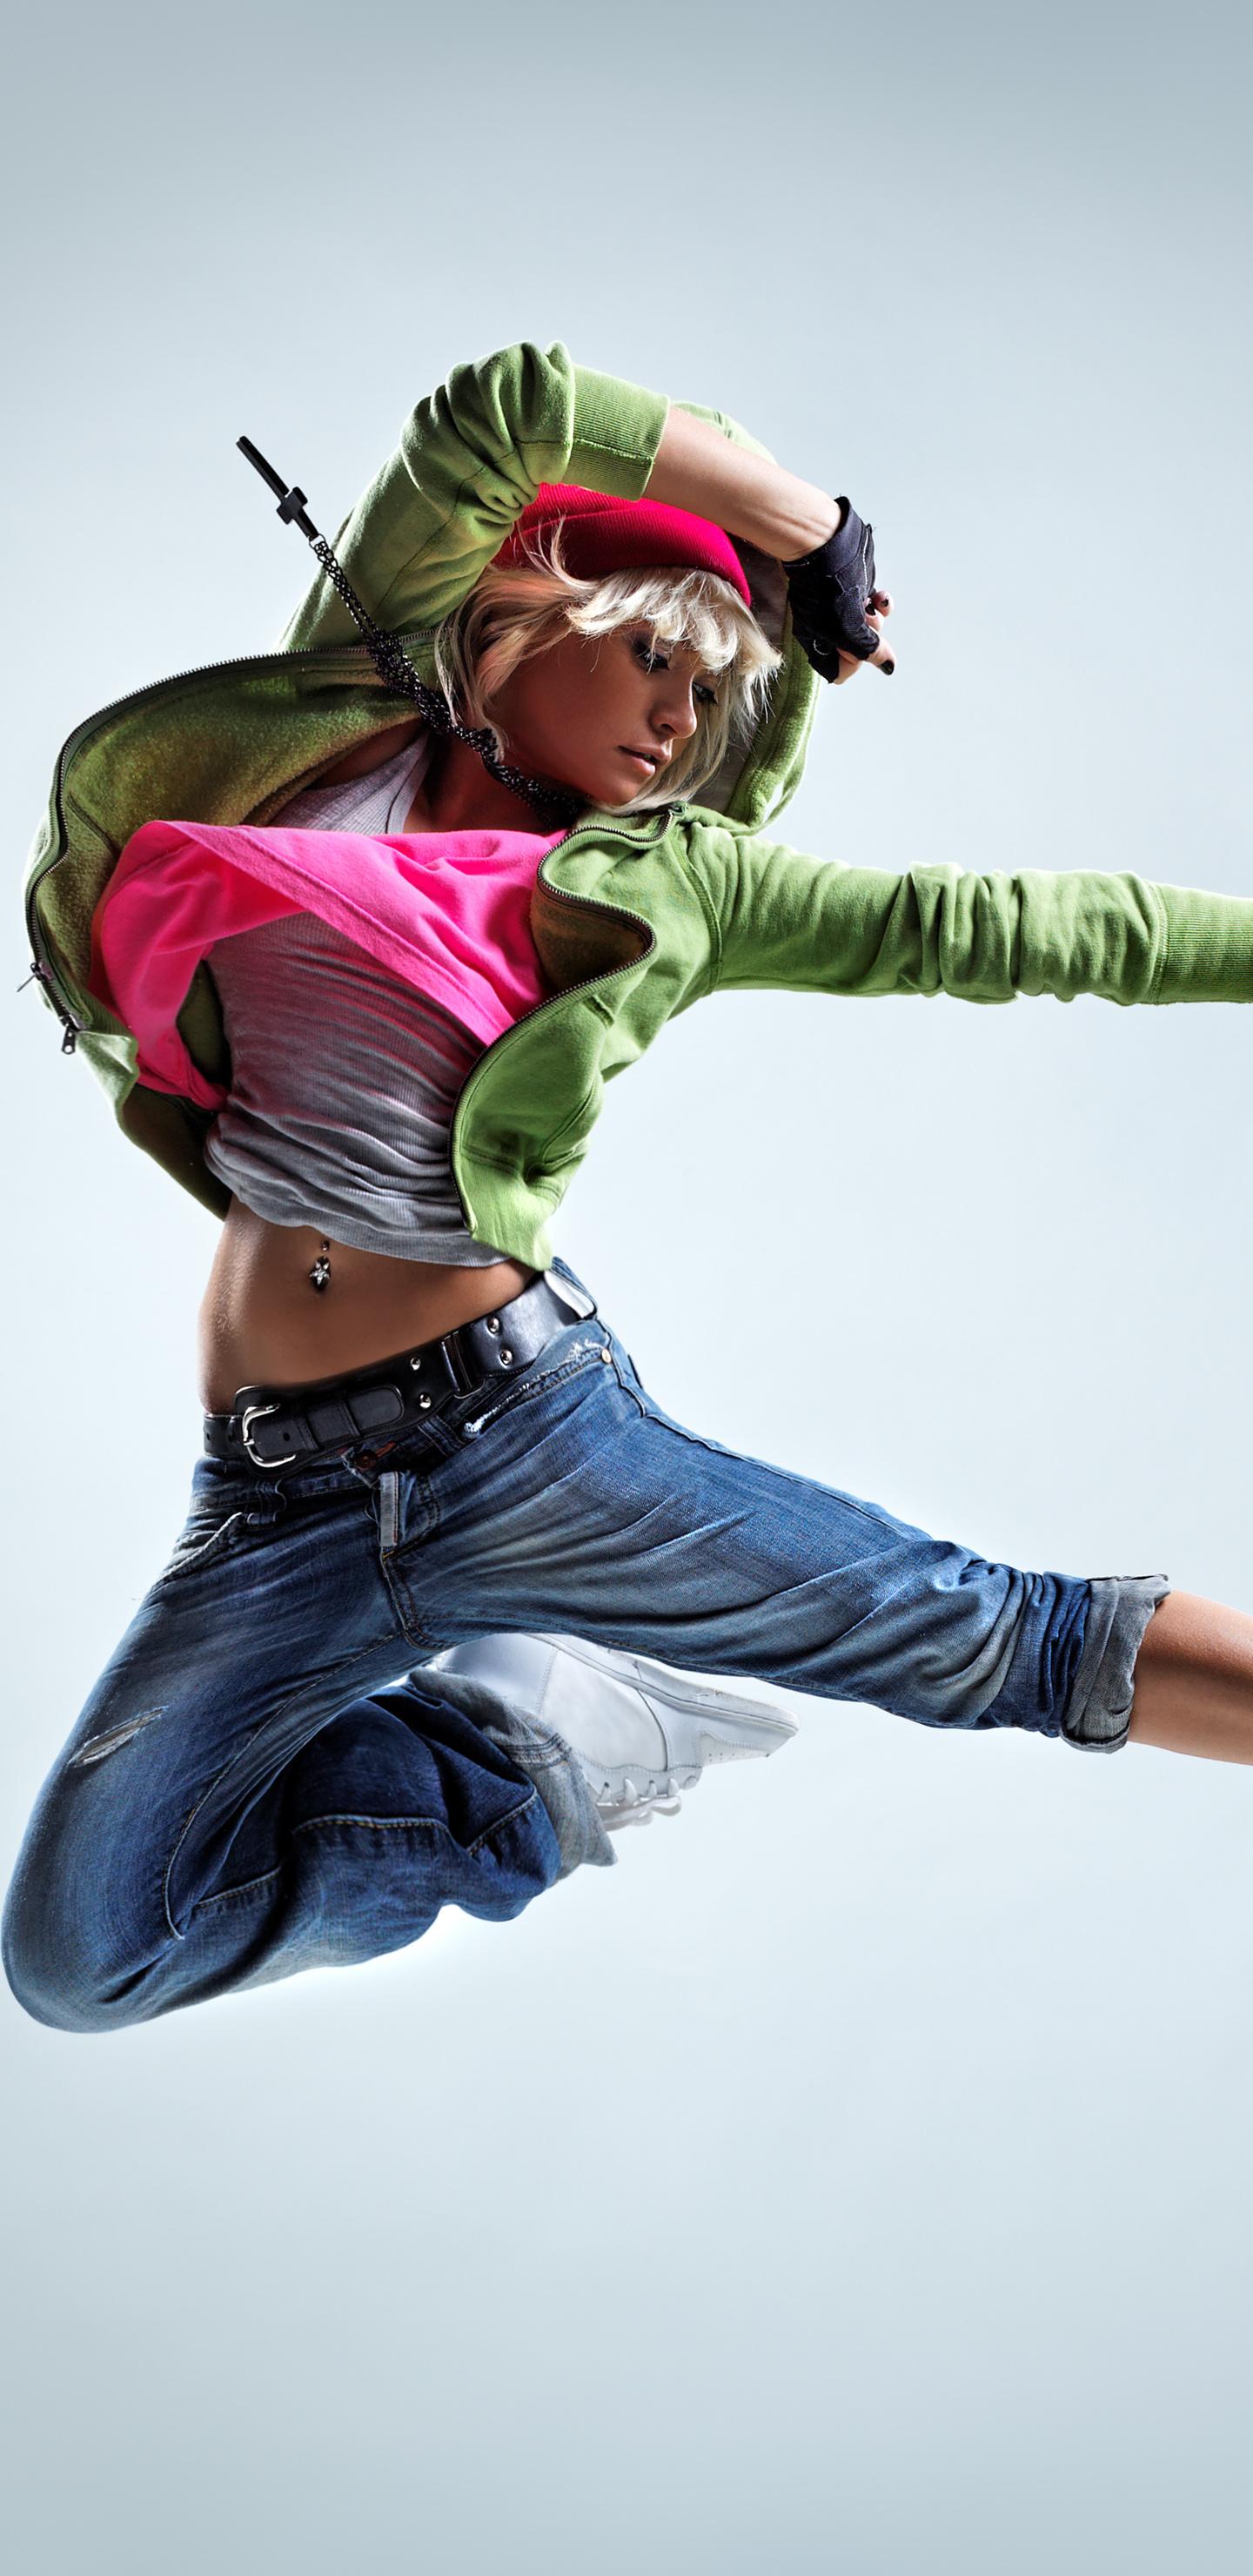 girl-jumping-kick-5k-yf.jpg